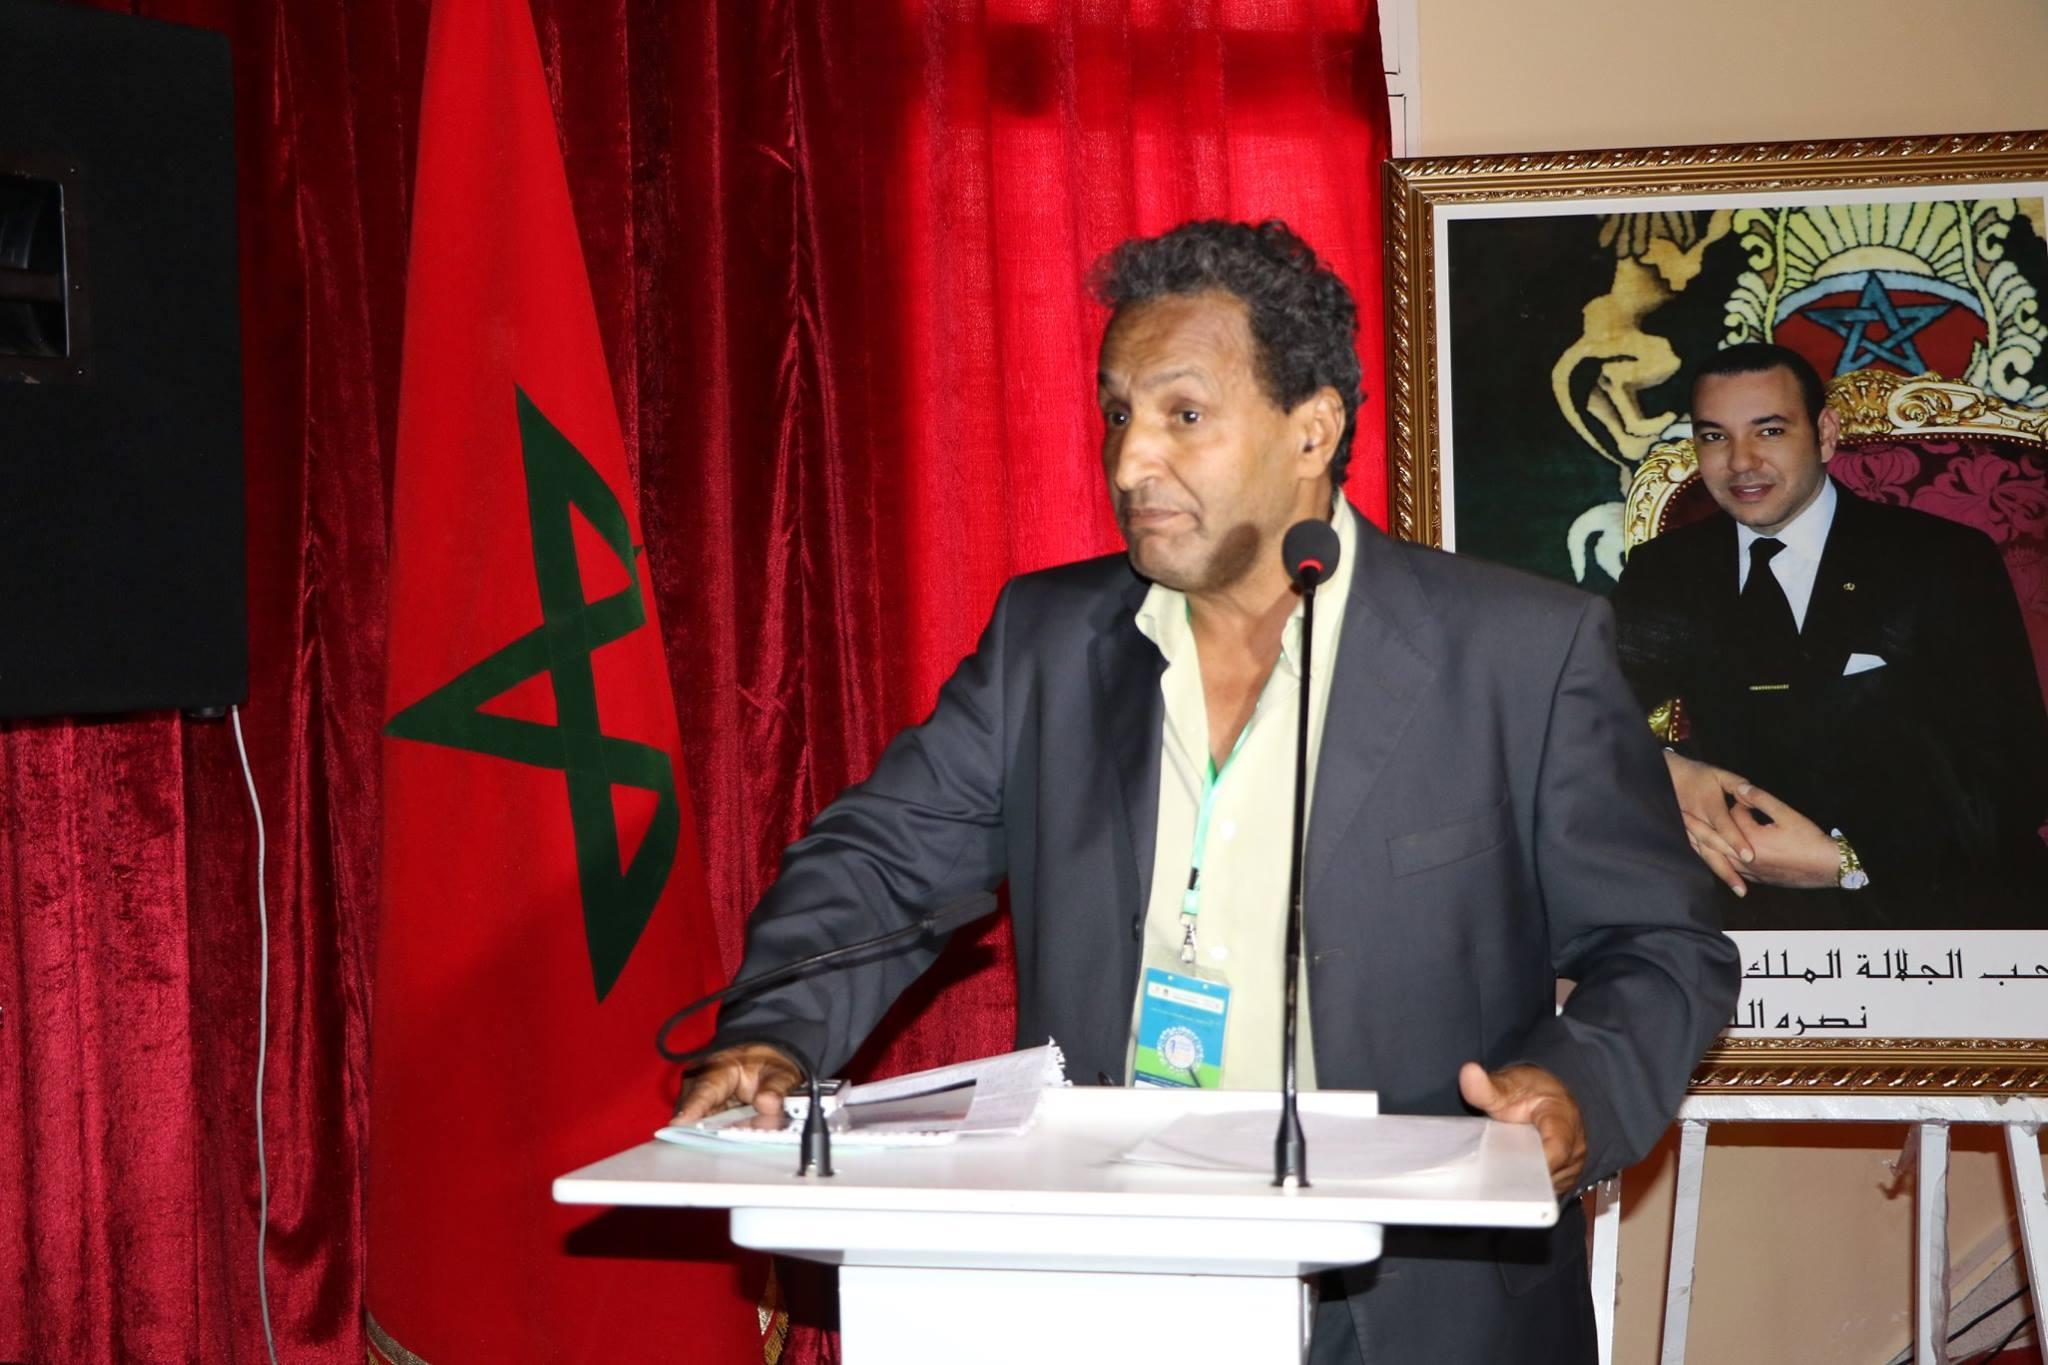 "Photo of الأمين العام للنقابة المستقلة للصحافيين المغاربة:  .. لا لصـحــافة وإعــلام  ""الضسارة وطلوع الـــدم"" ..!"